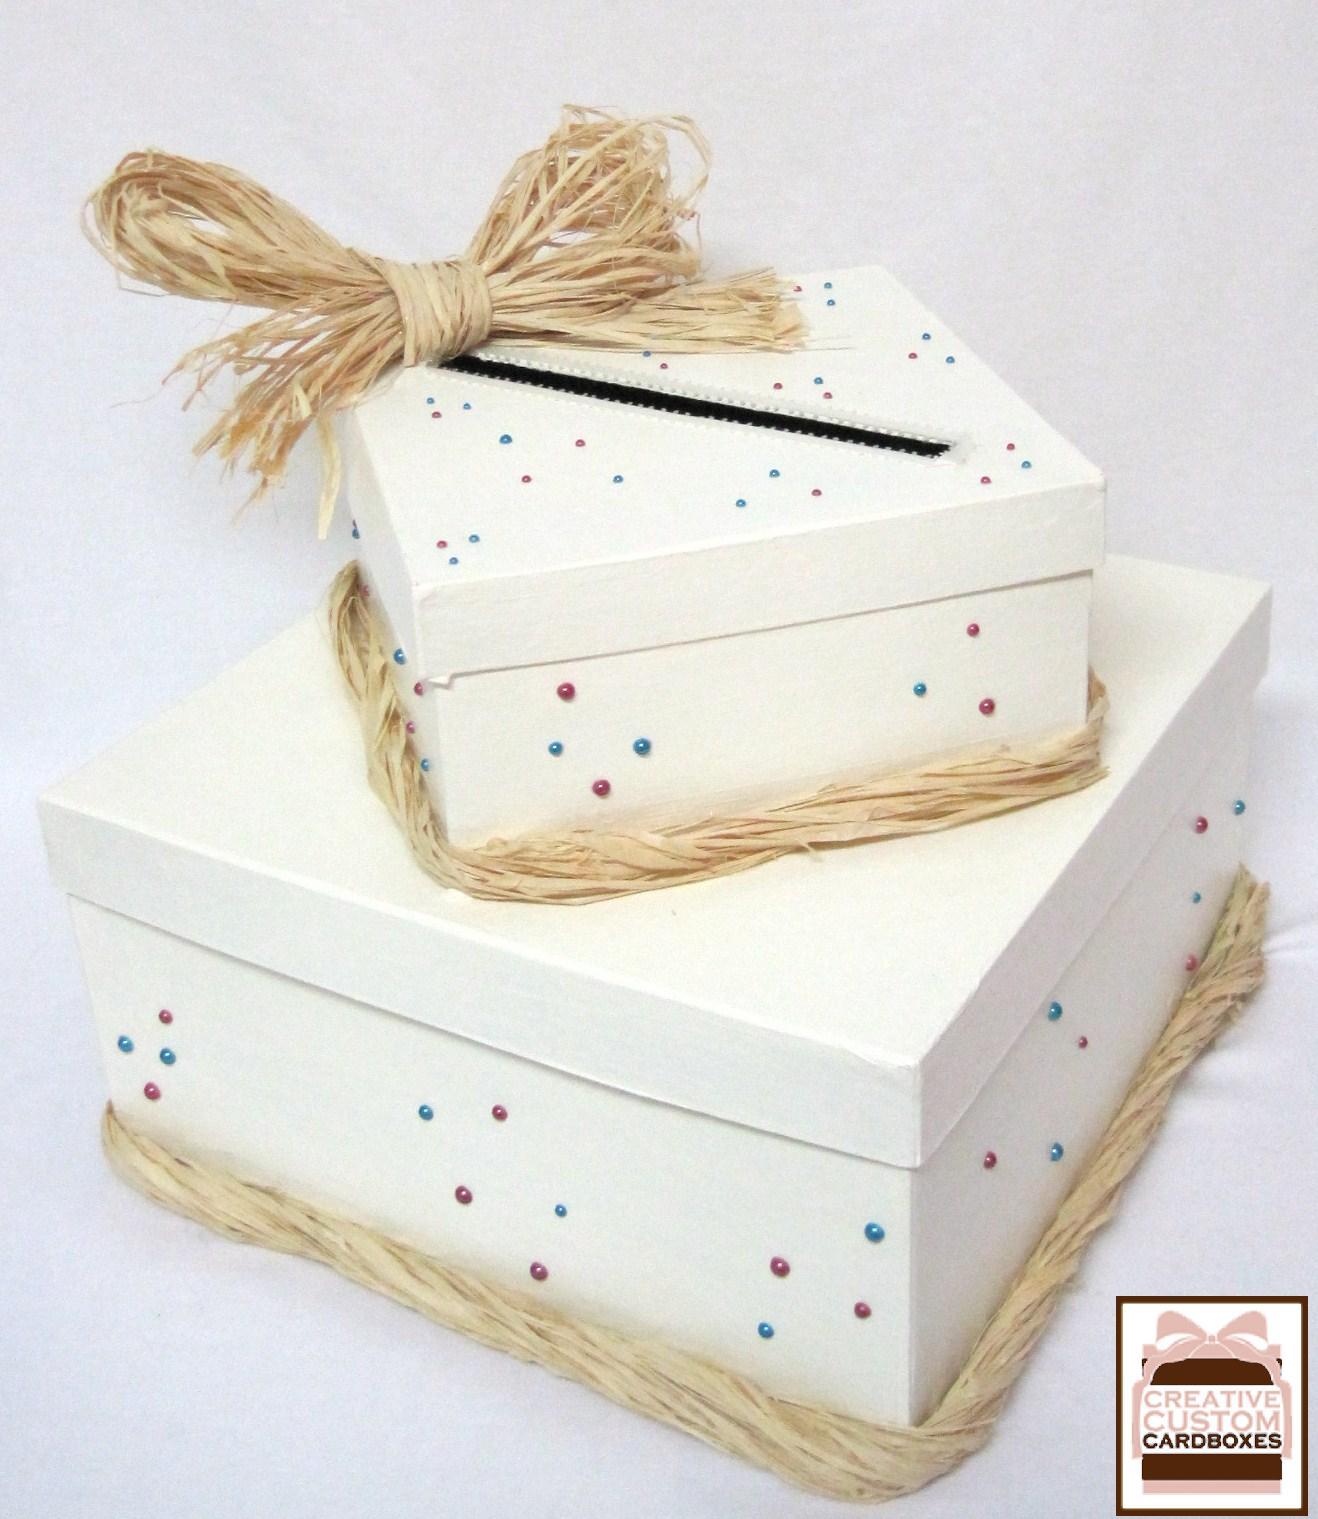 Creative Custom Card Boxes Card Box Creations Eco CHIC